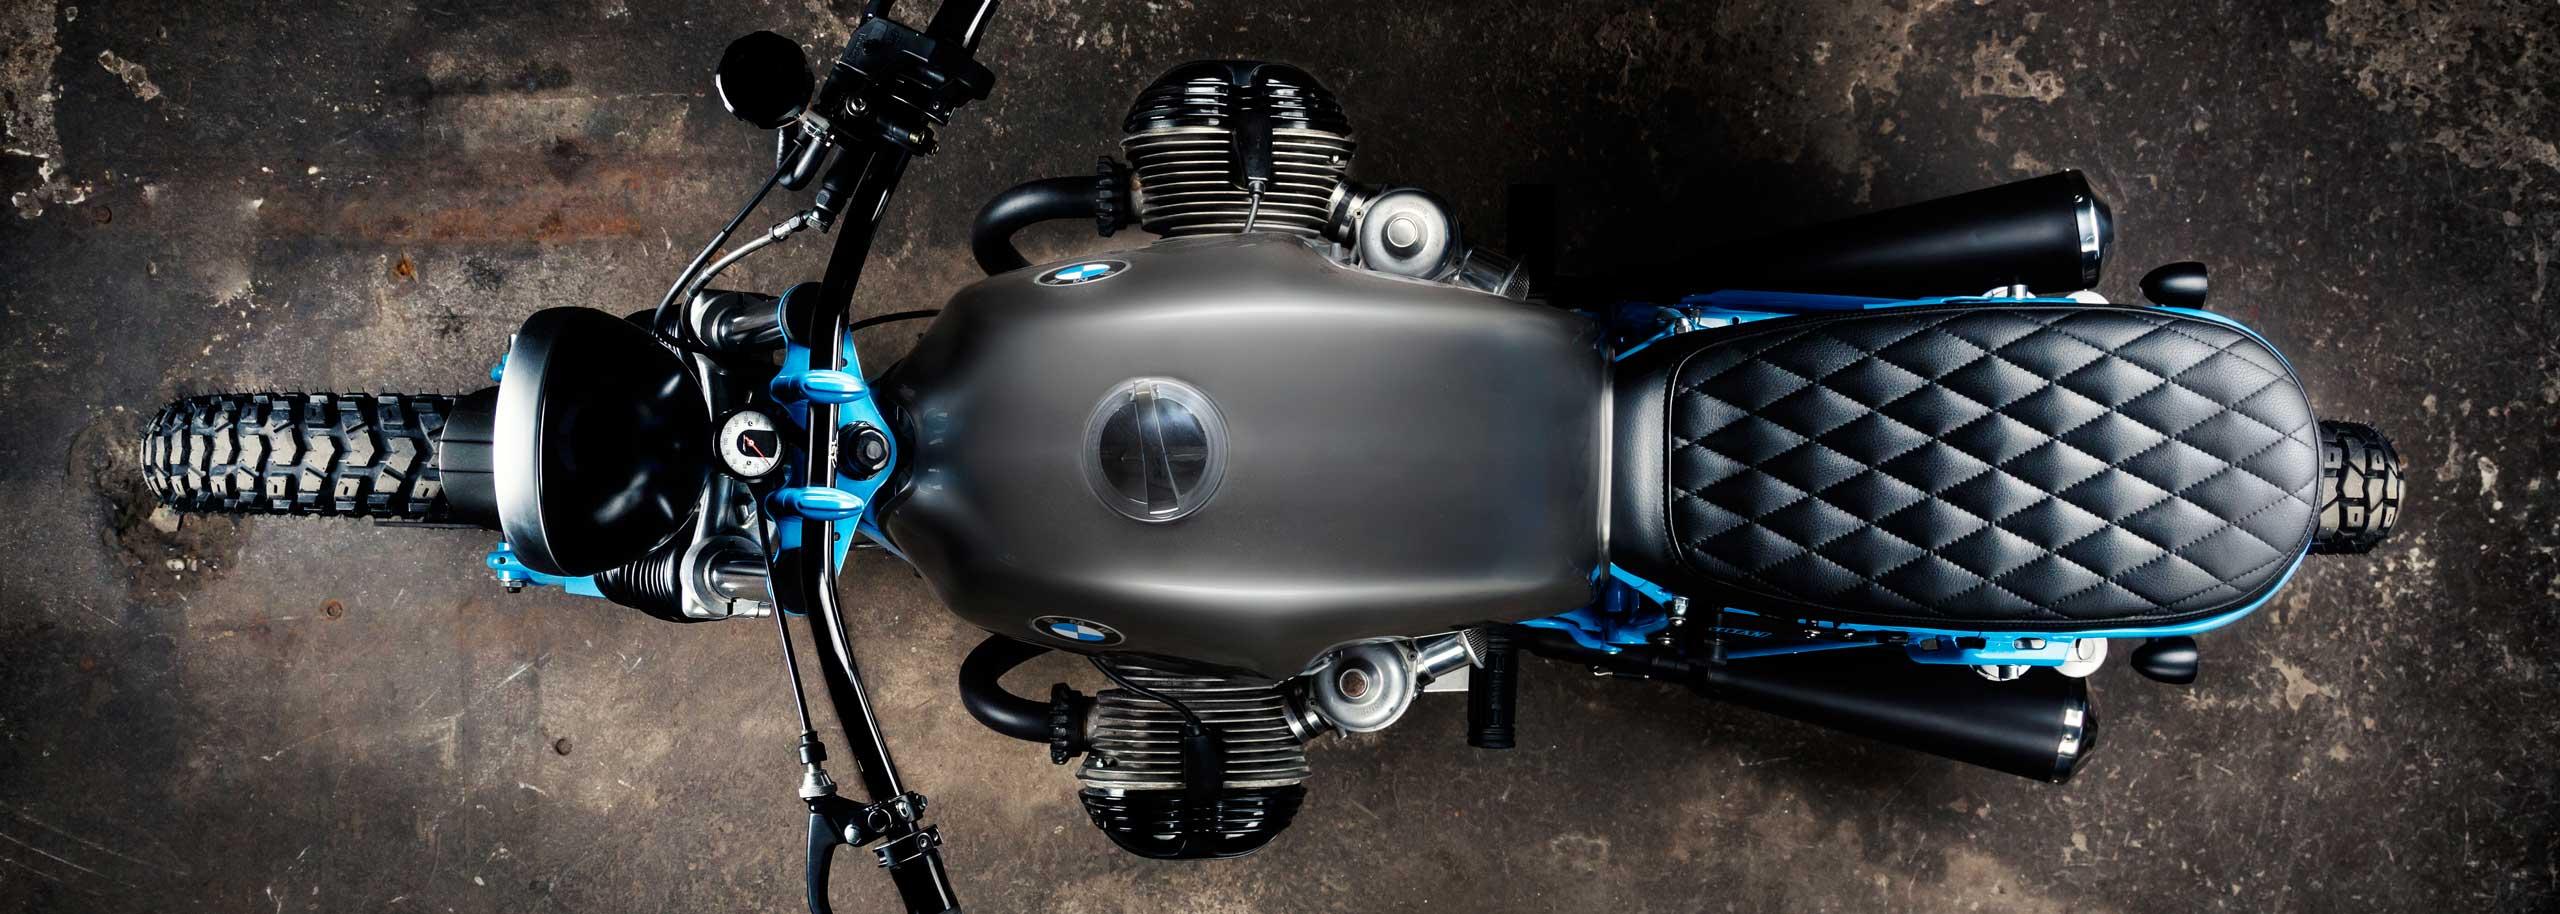 04_TITAN-PRATTER_BMW-R100-RS_Cafe-Racer-Graz-Motorrad-Umbau-Austria-Vintage_Custom_Kellermann_Motogadget_Rizoma_Brembo_LSL_Sebring